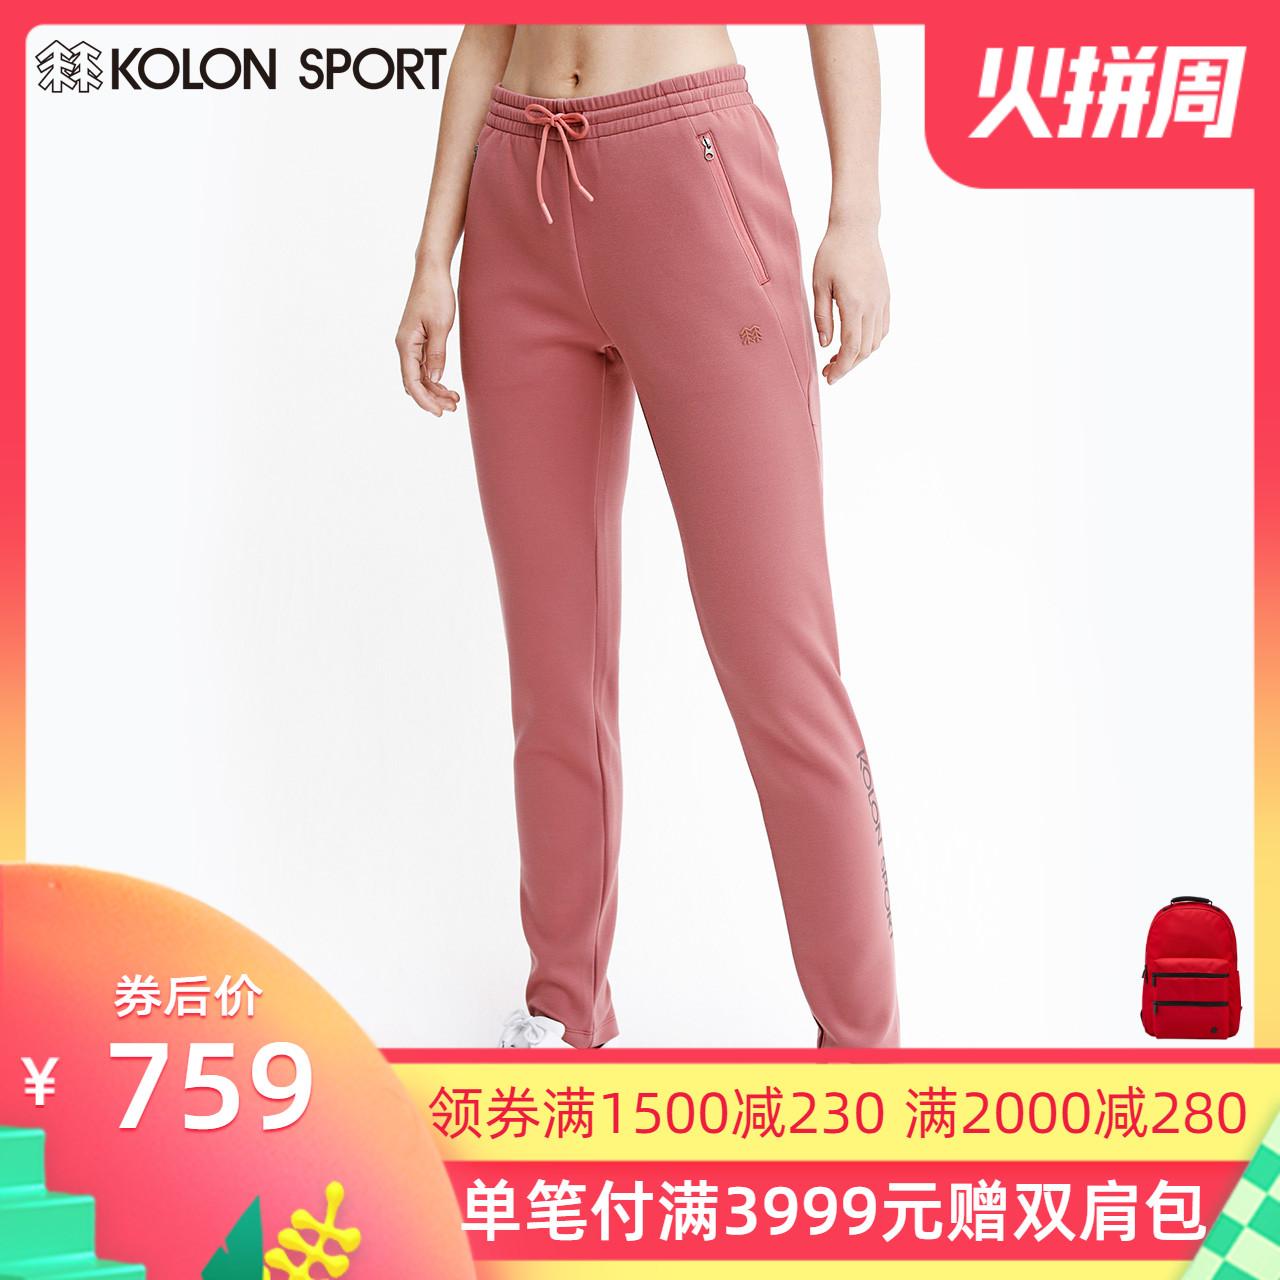 kolonsport可隆女子弹力针织运动裤